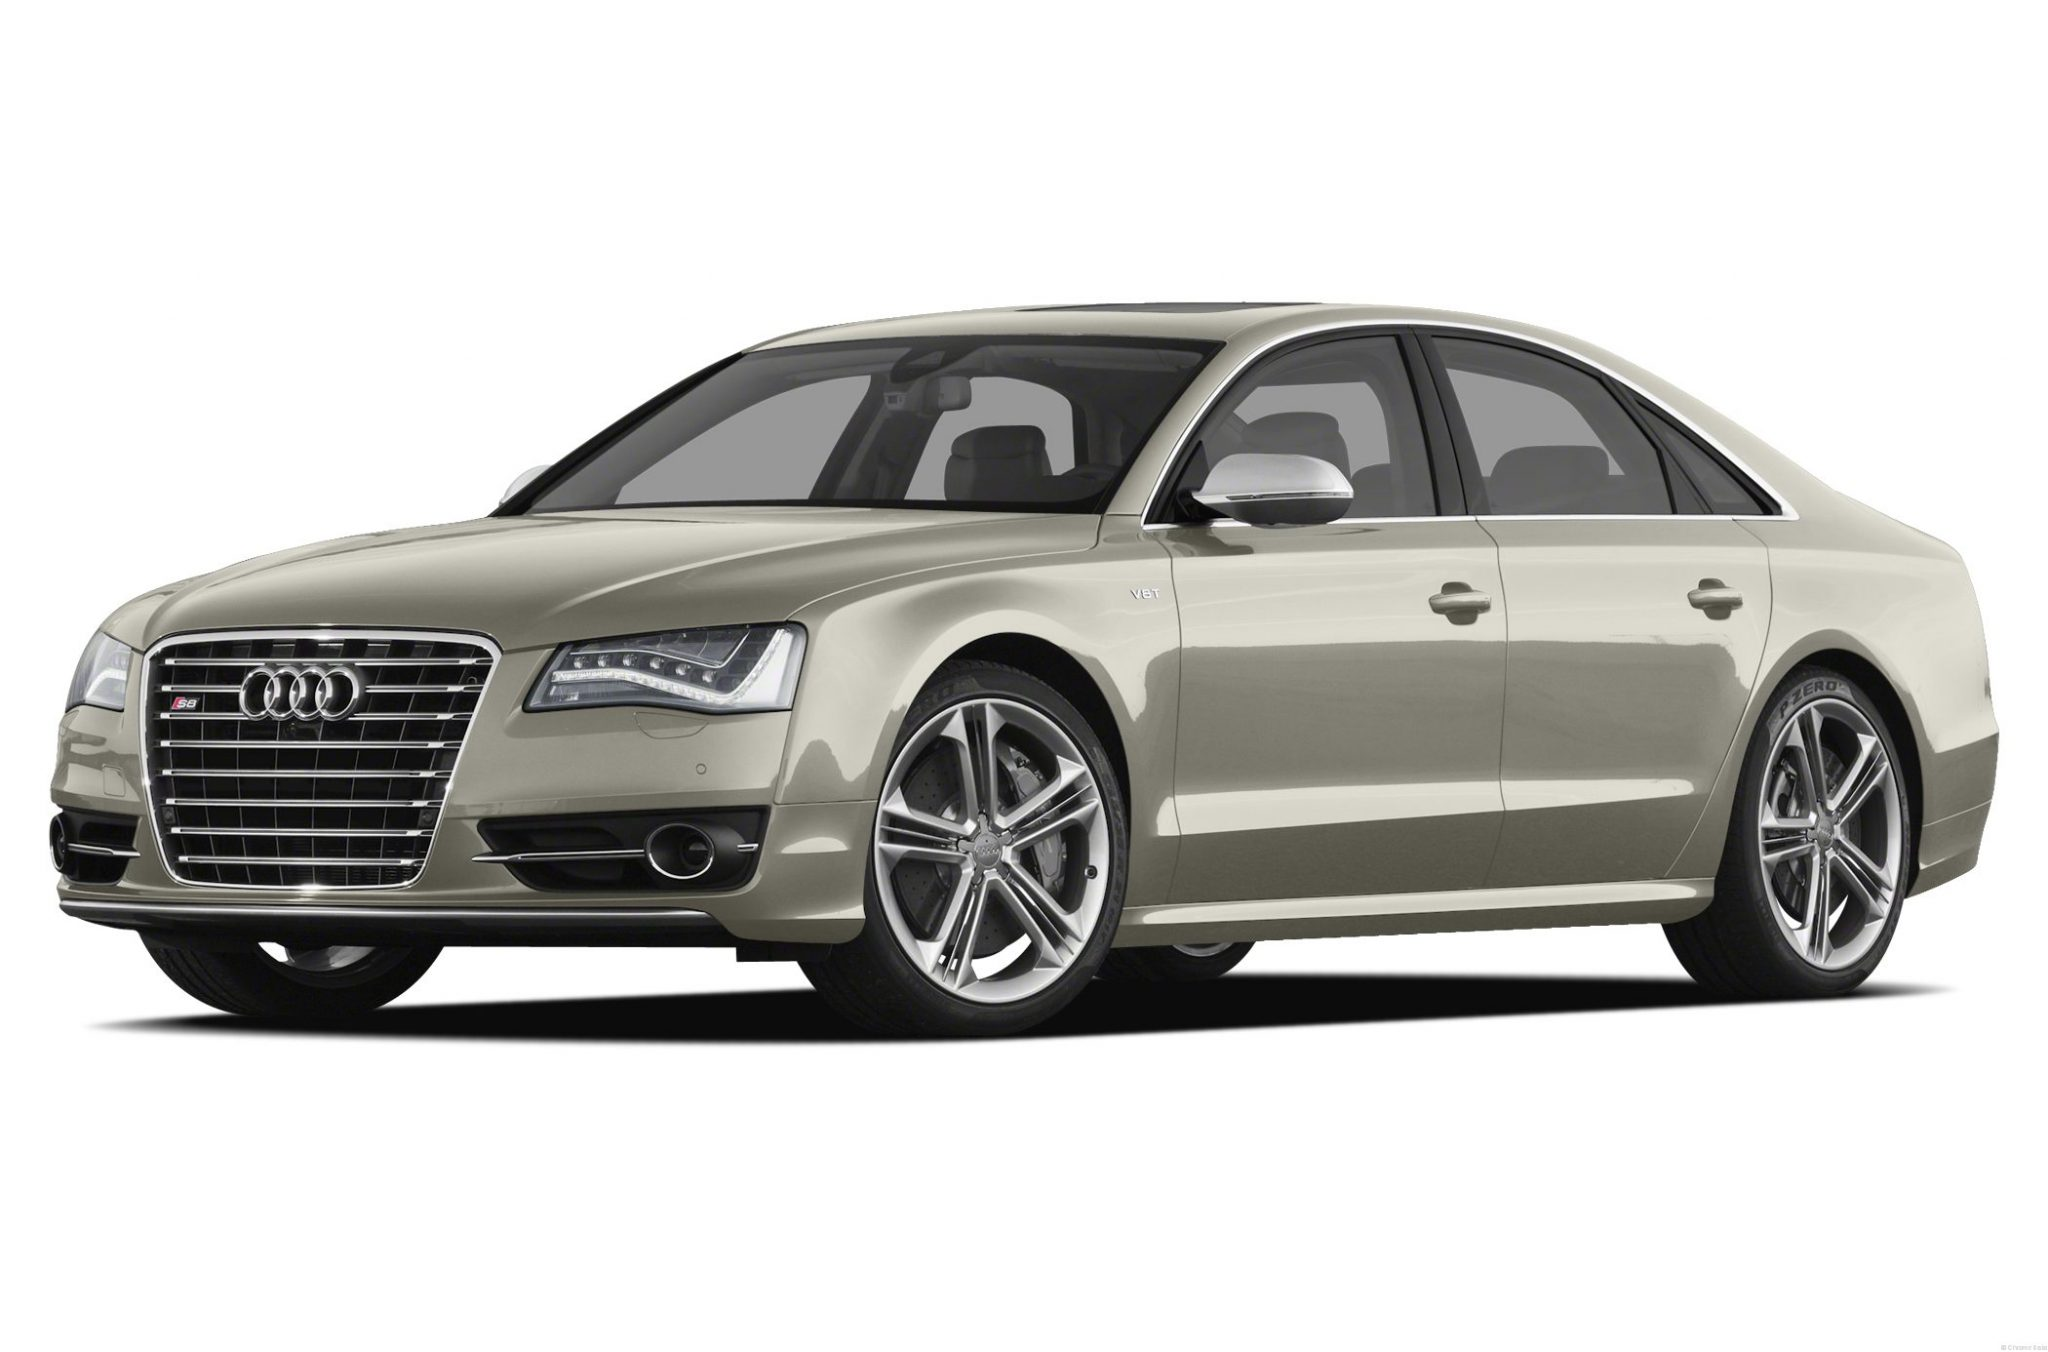 samochód luksusowy klasy S Premium